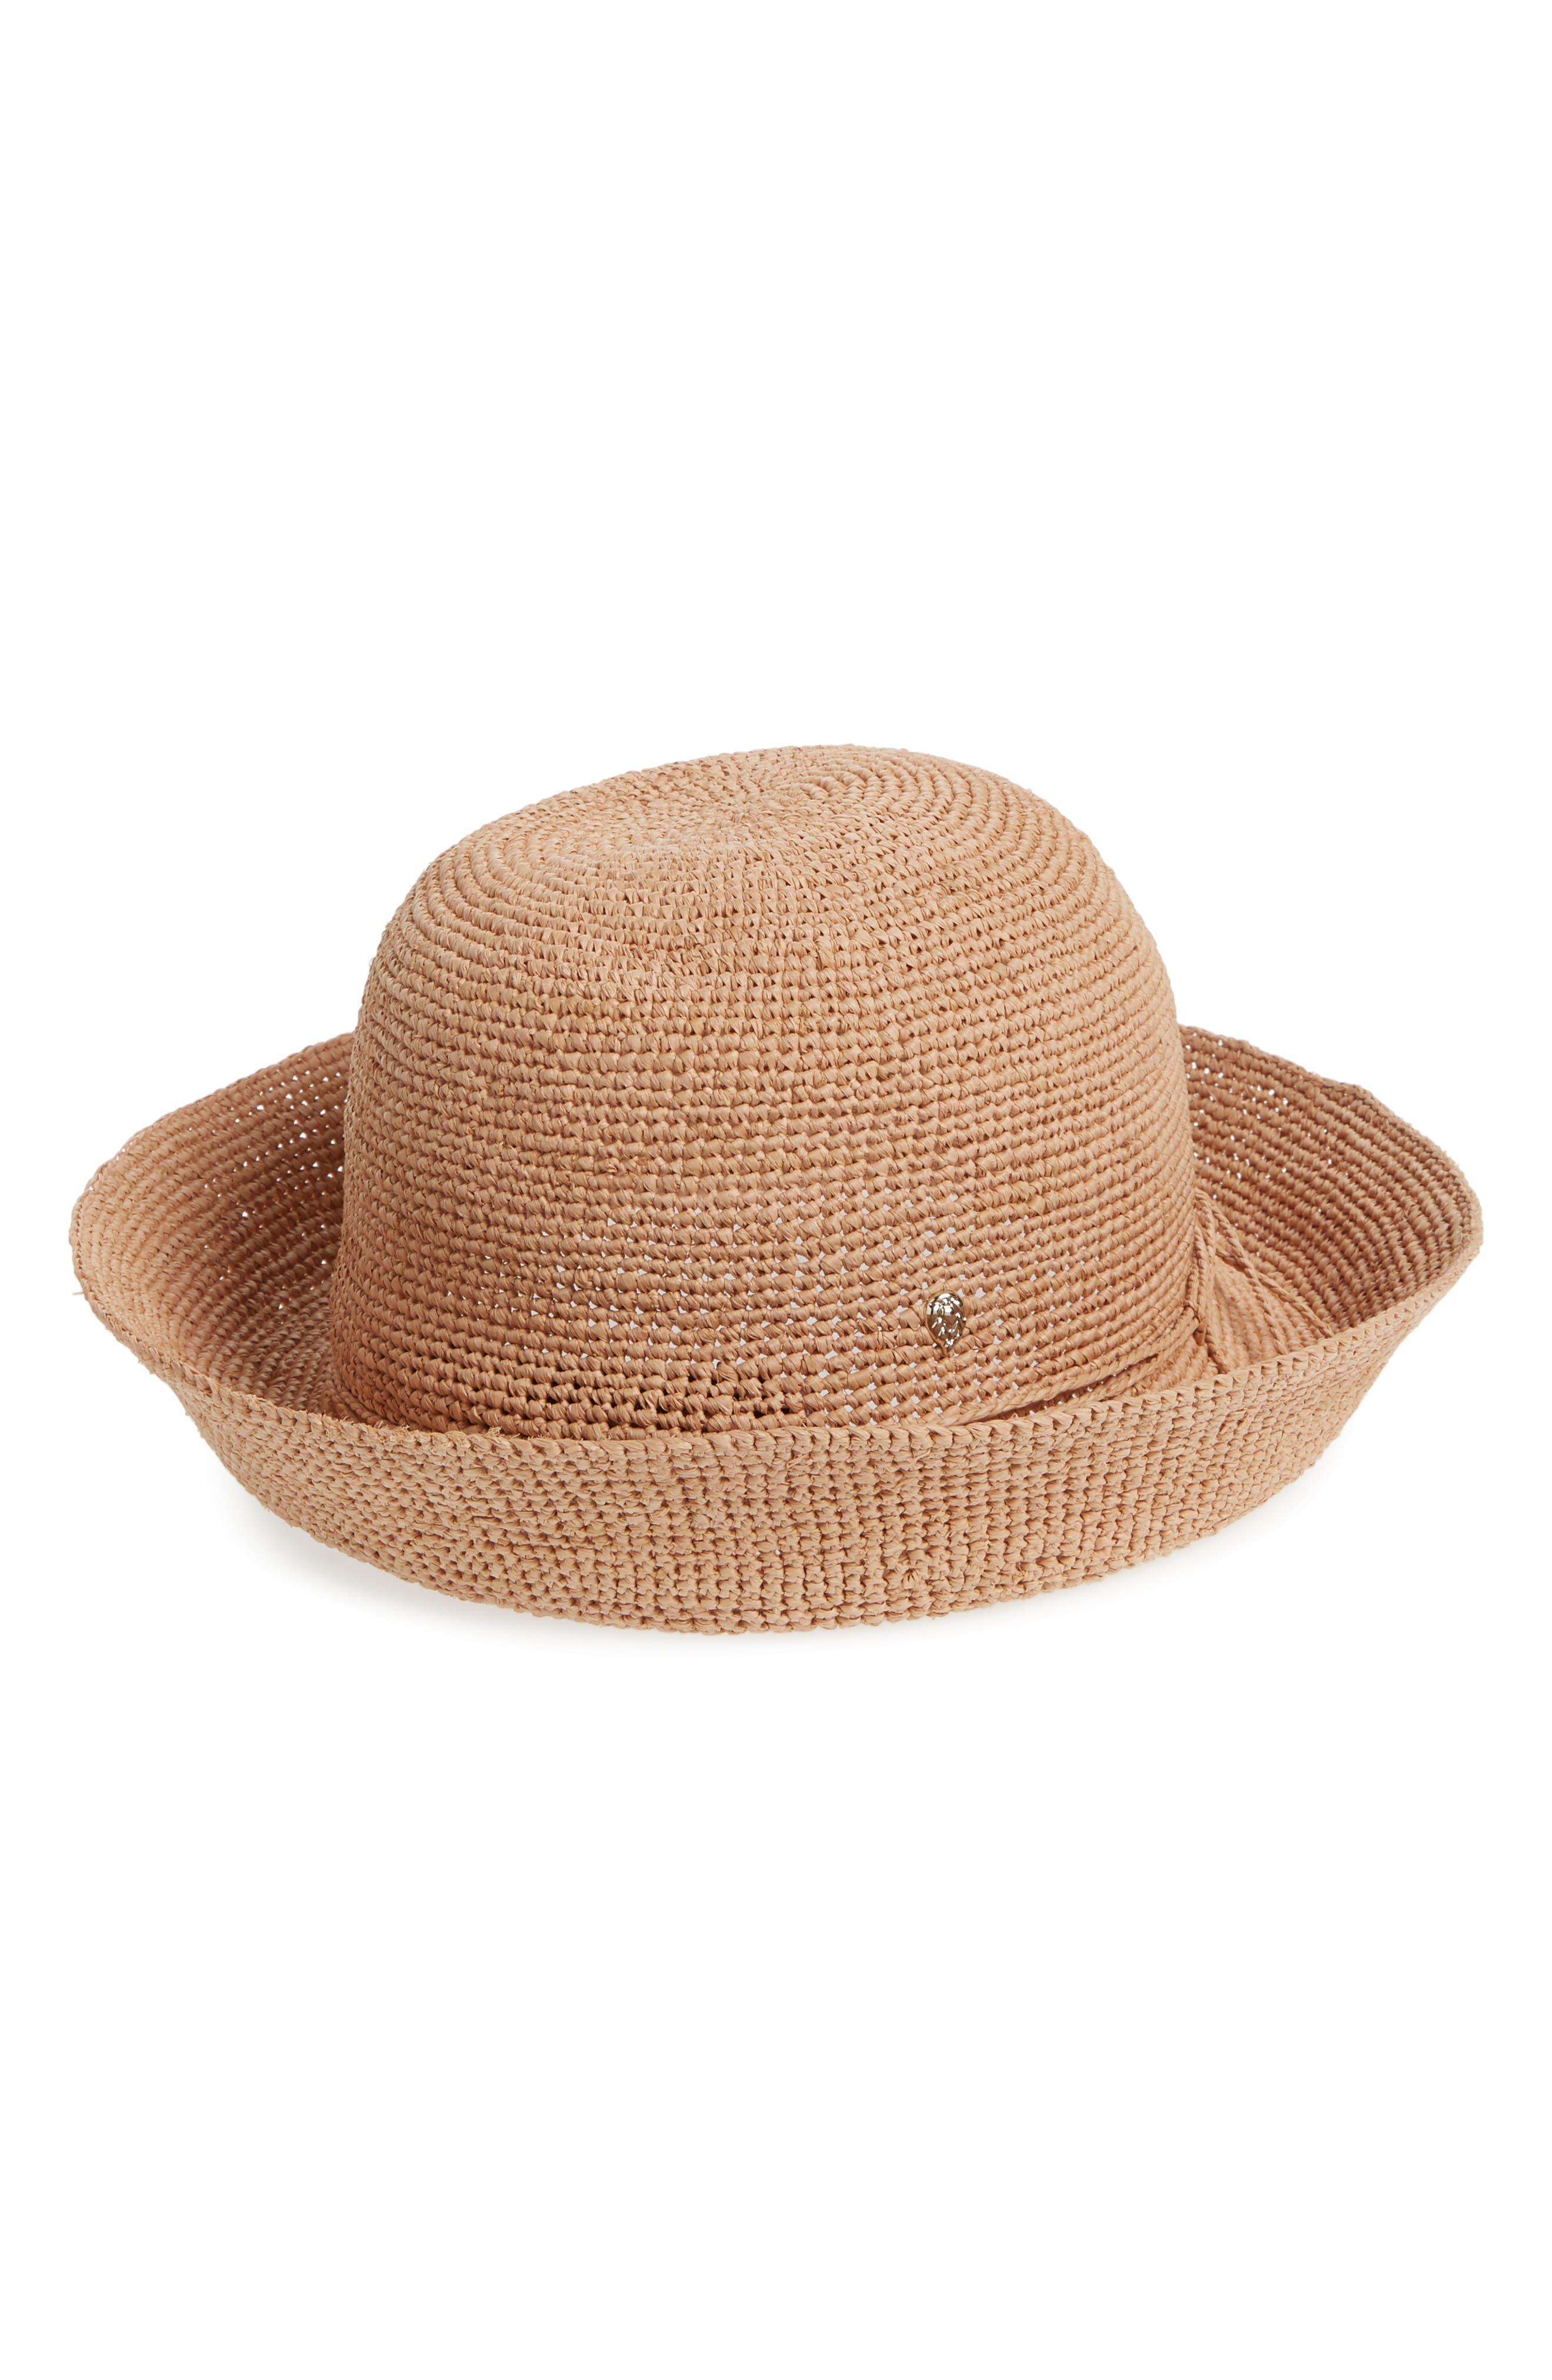 Classic Upturn Crocheted Raffia Hat,                         Main,                         color, Nougat